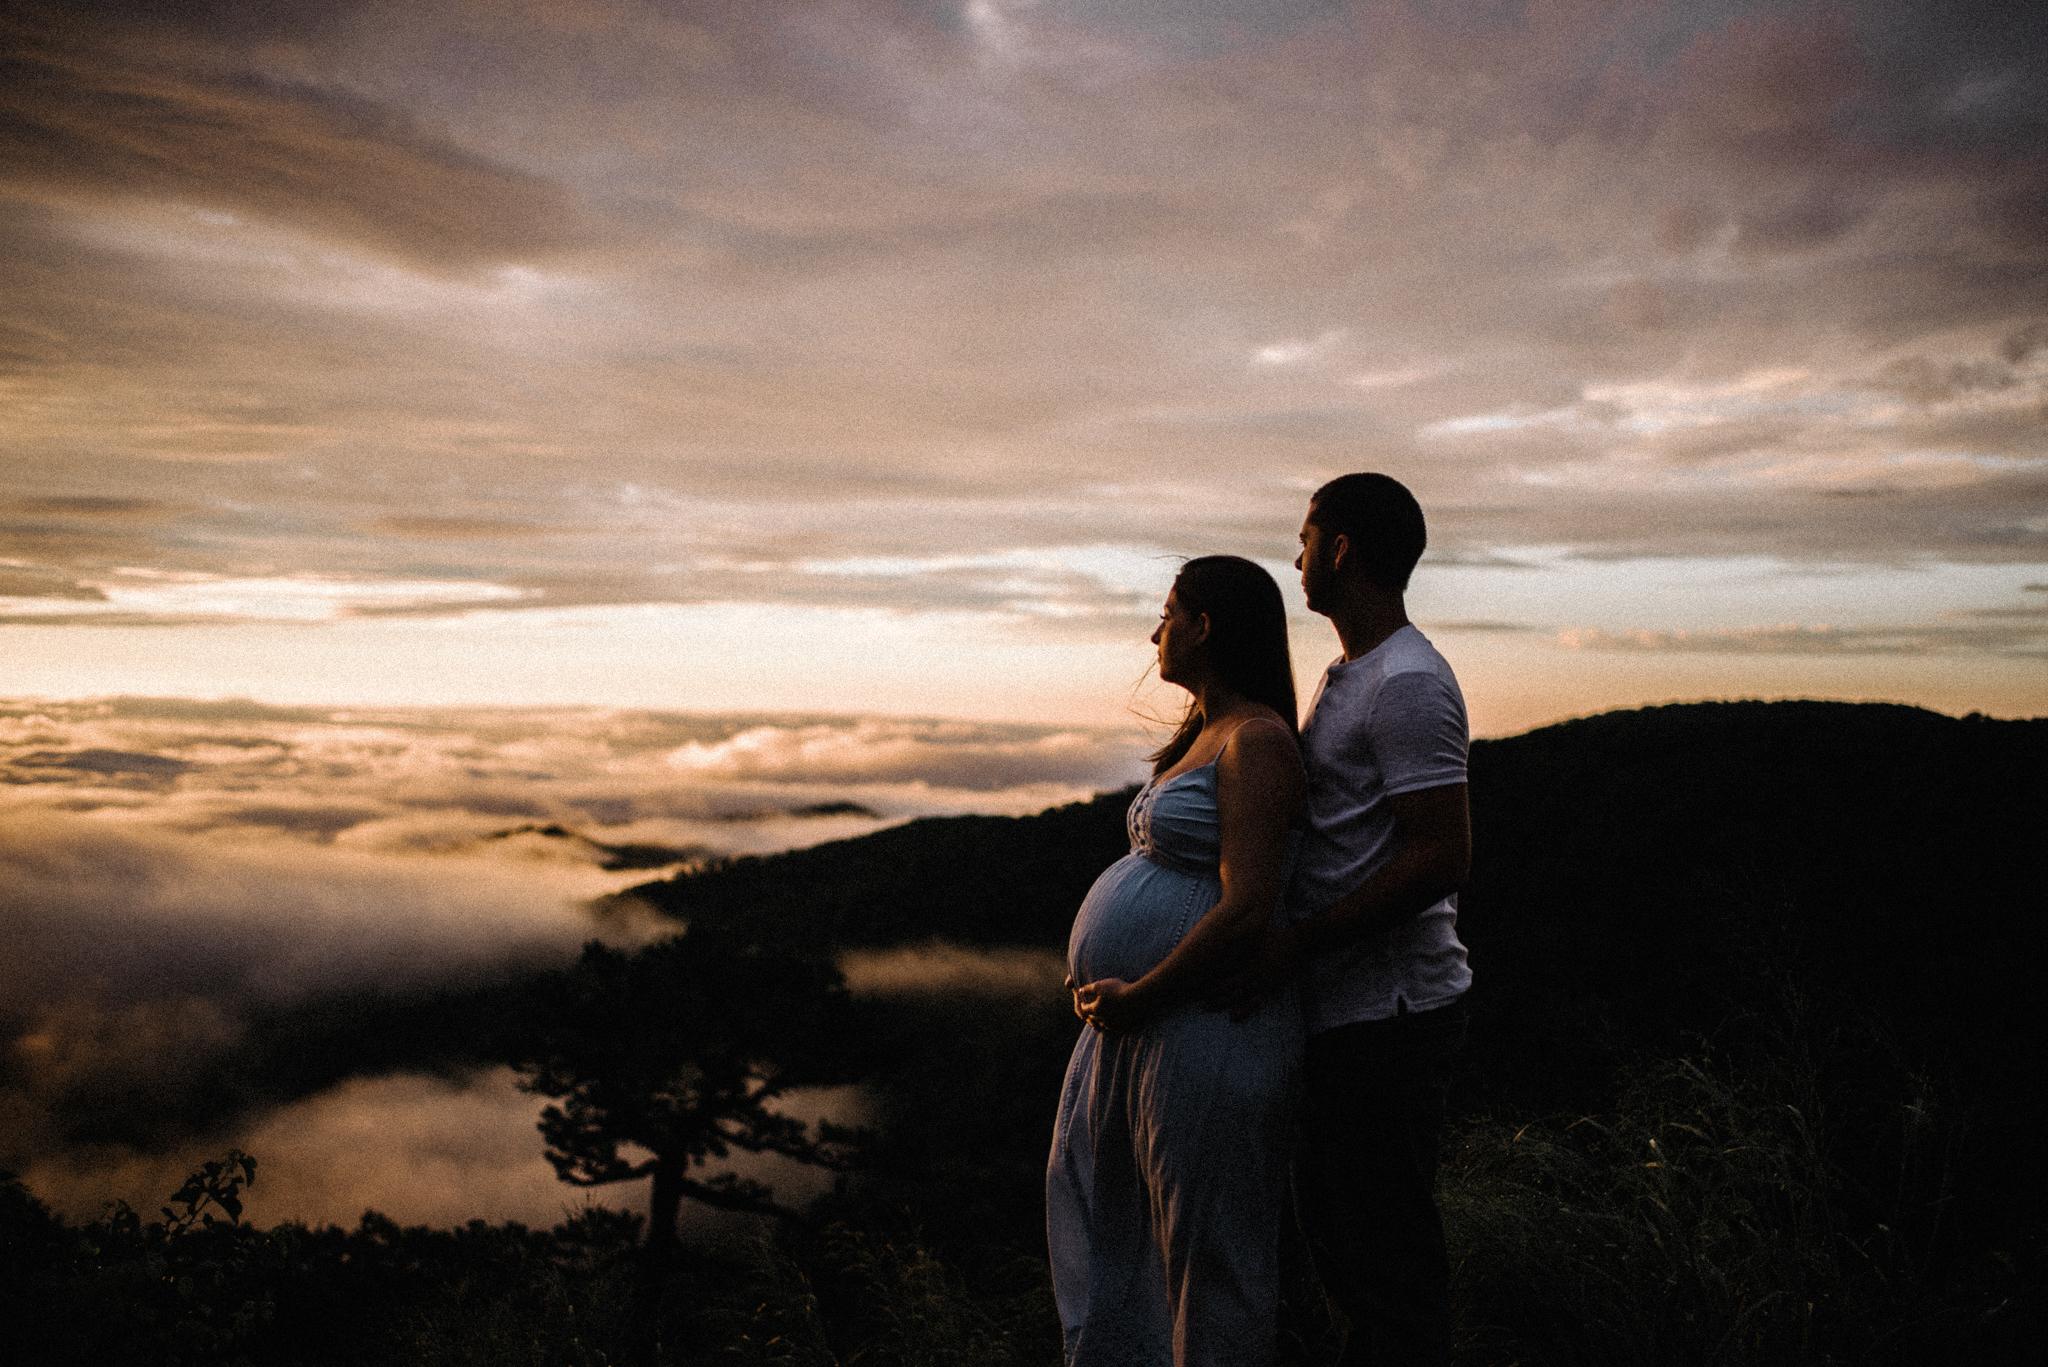 Mandy Spencer Maternity Sunrise Session Shenandoah National Park - White Sails Photography Creative_6.JPG